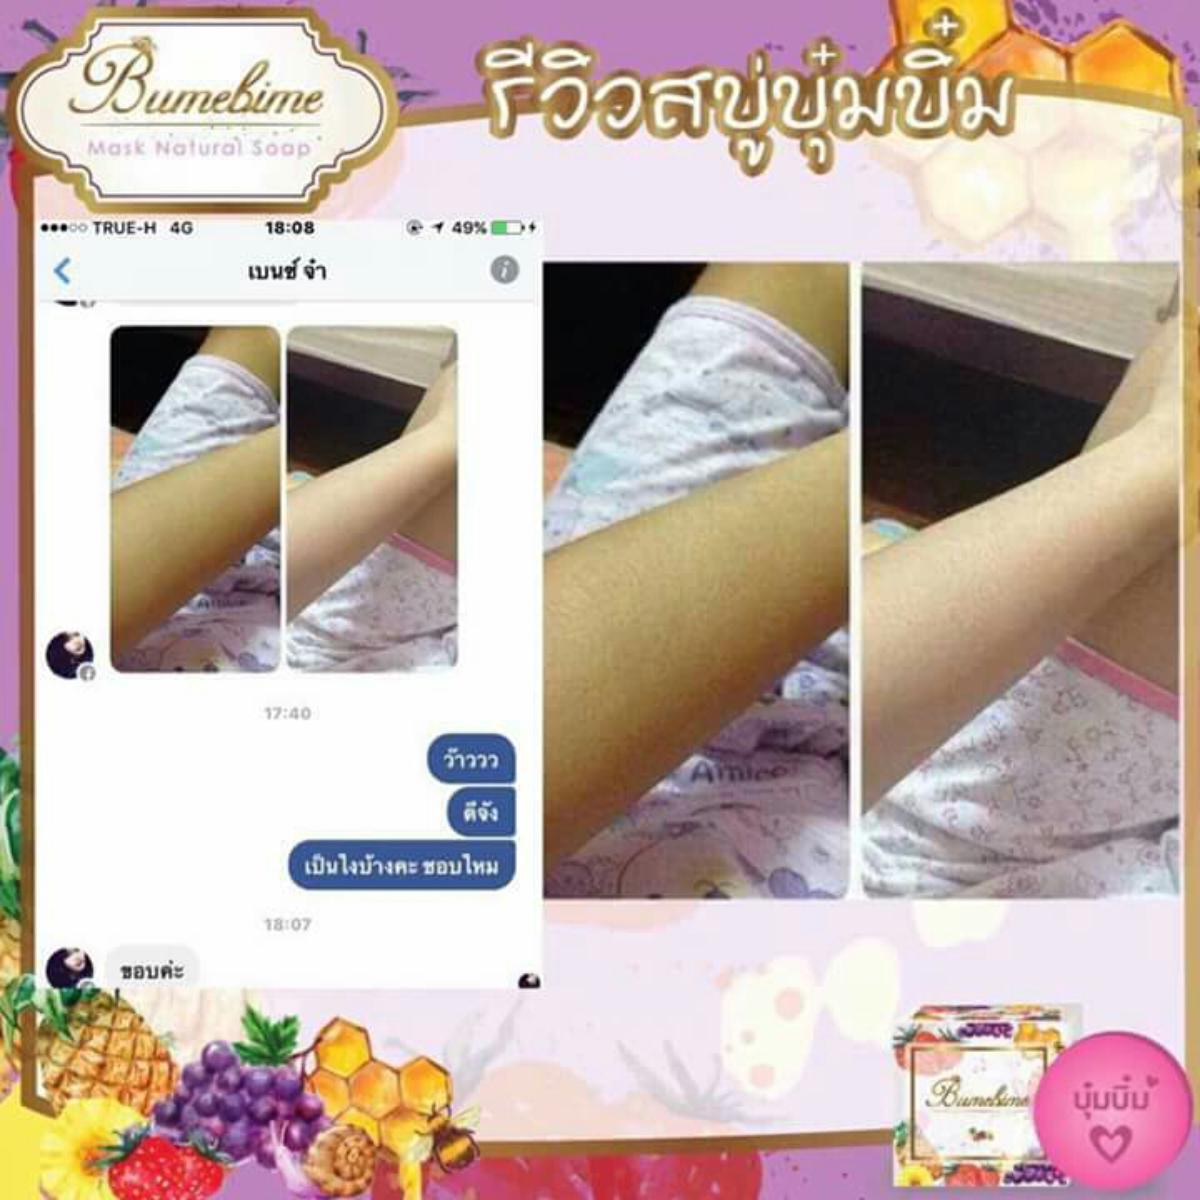 soap-bumebime-1483643828-1730482-1483897500